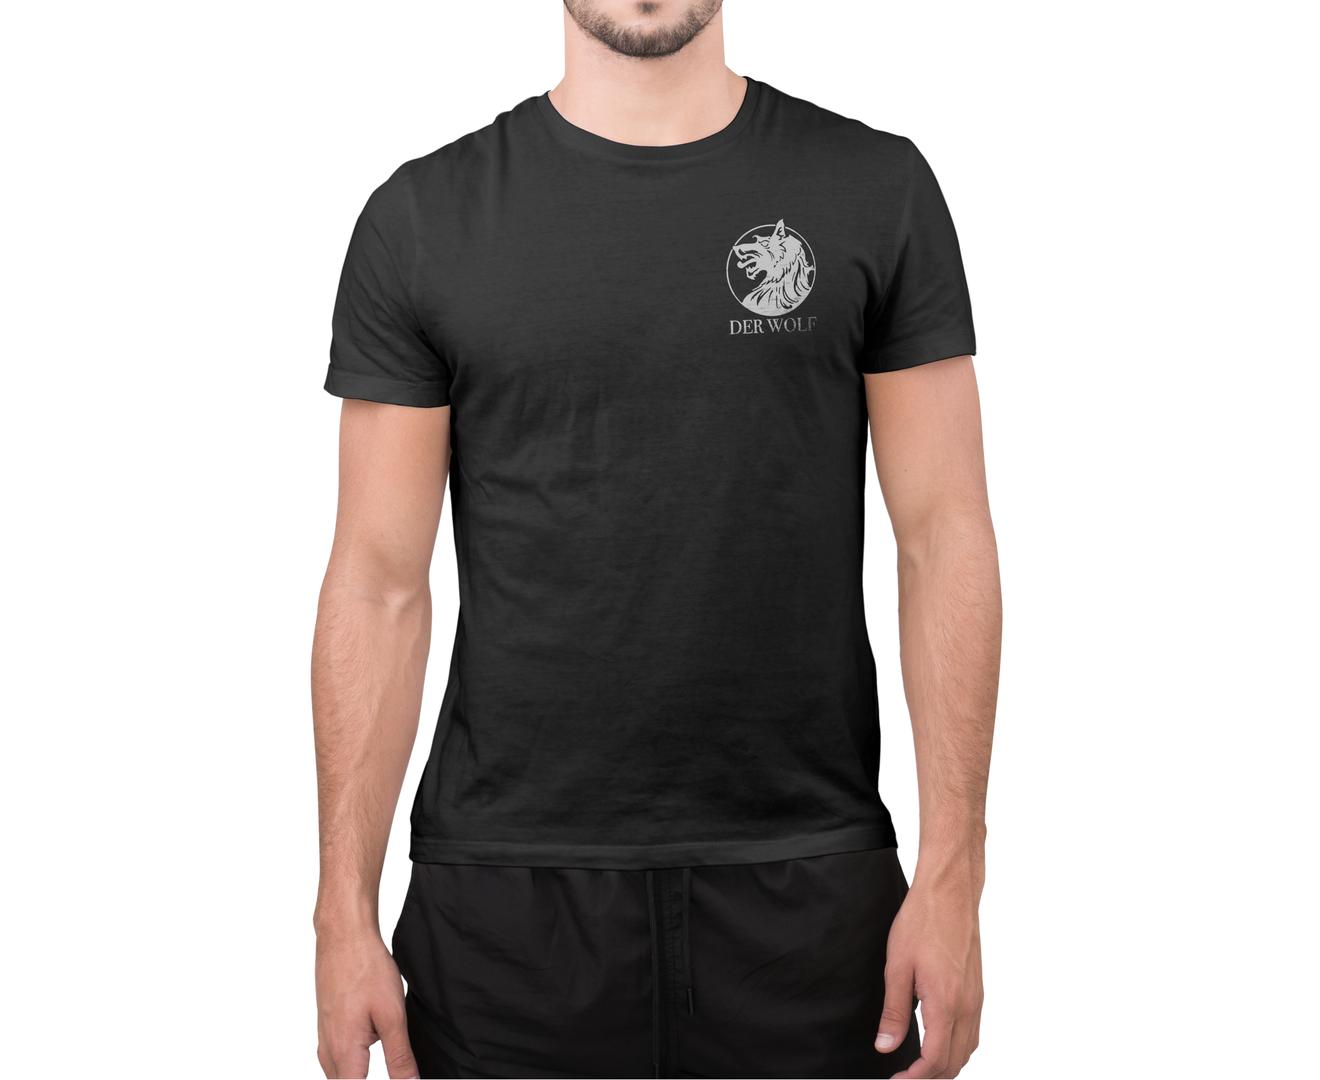 T-Shirt-men2.png